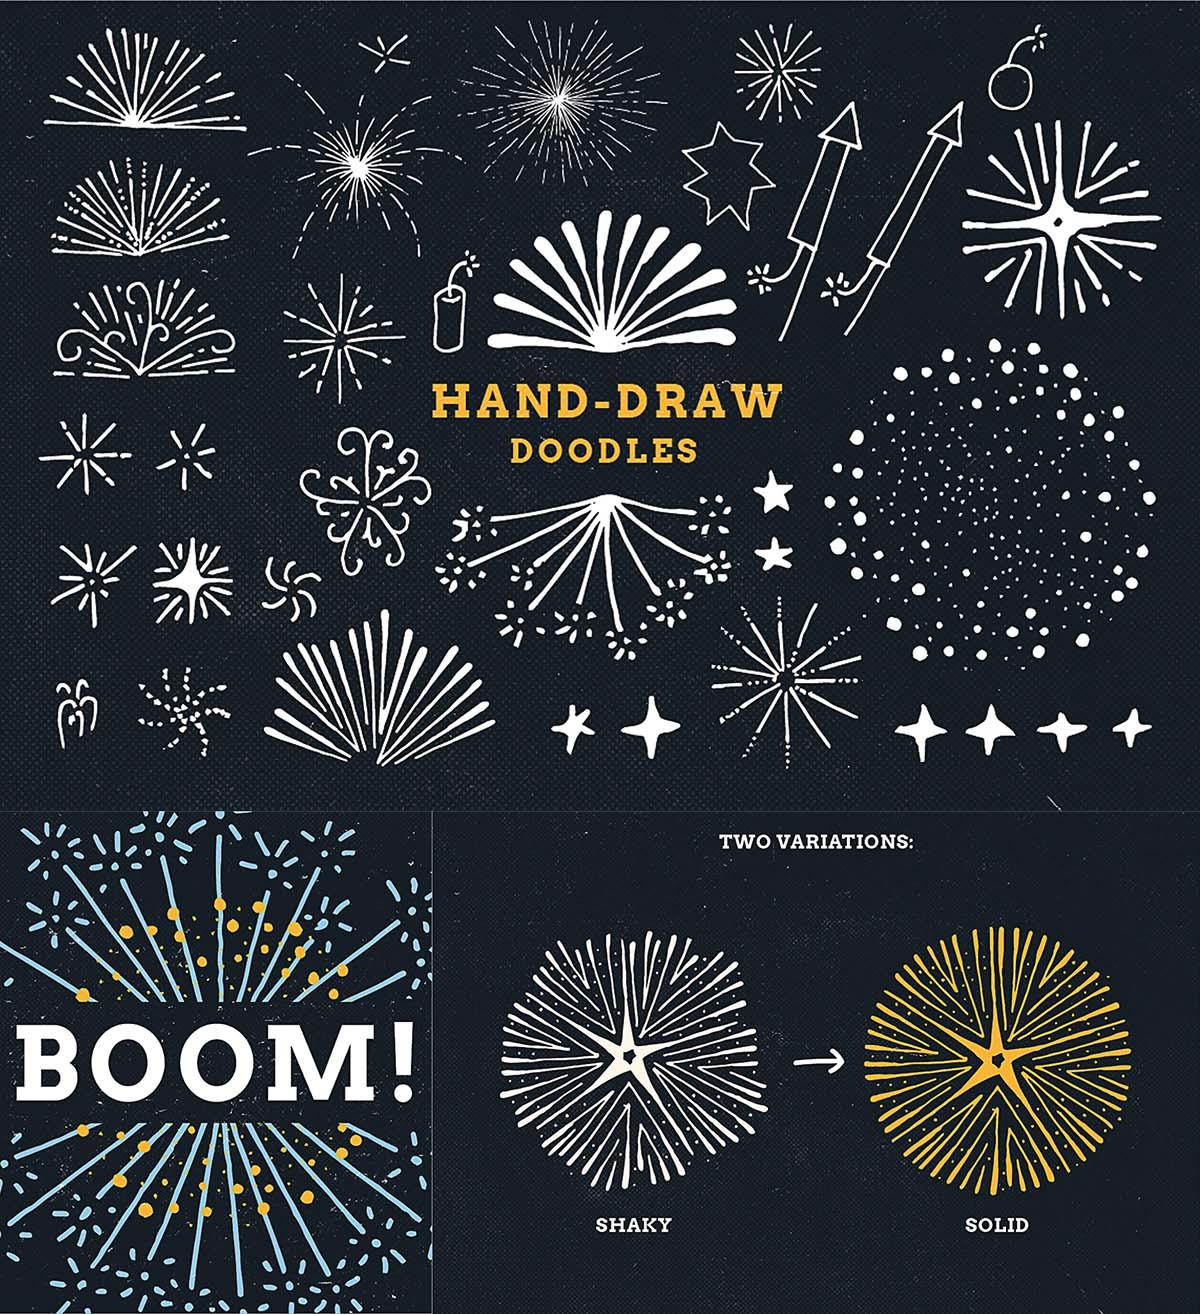 Firework doodles and illustrations sketches vector set